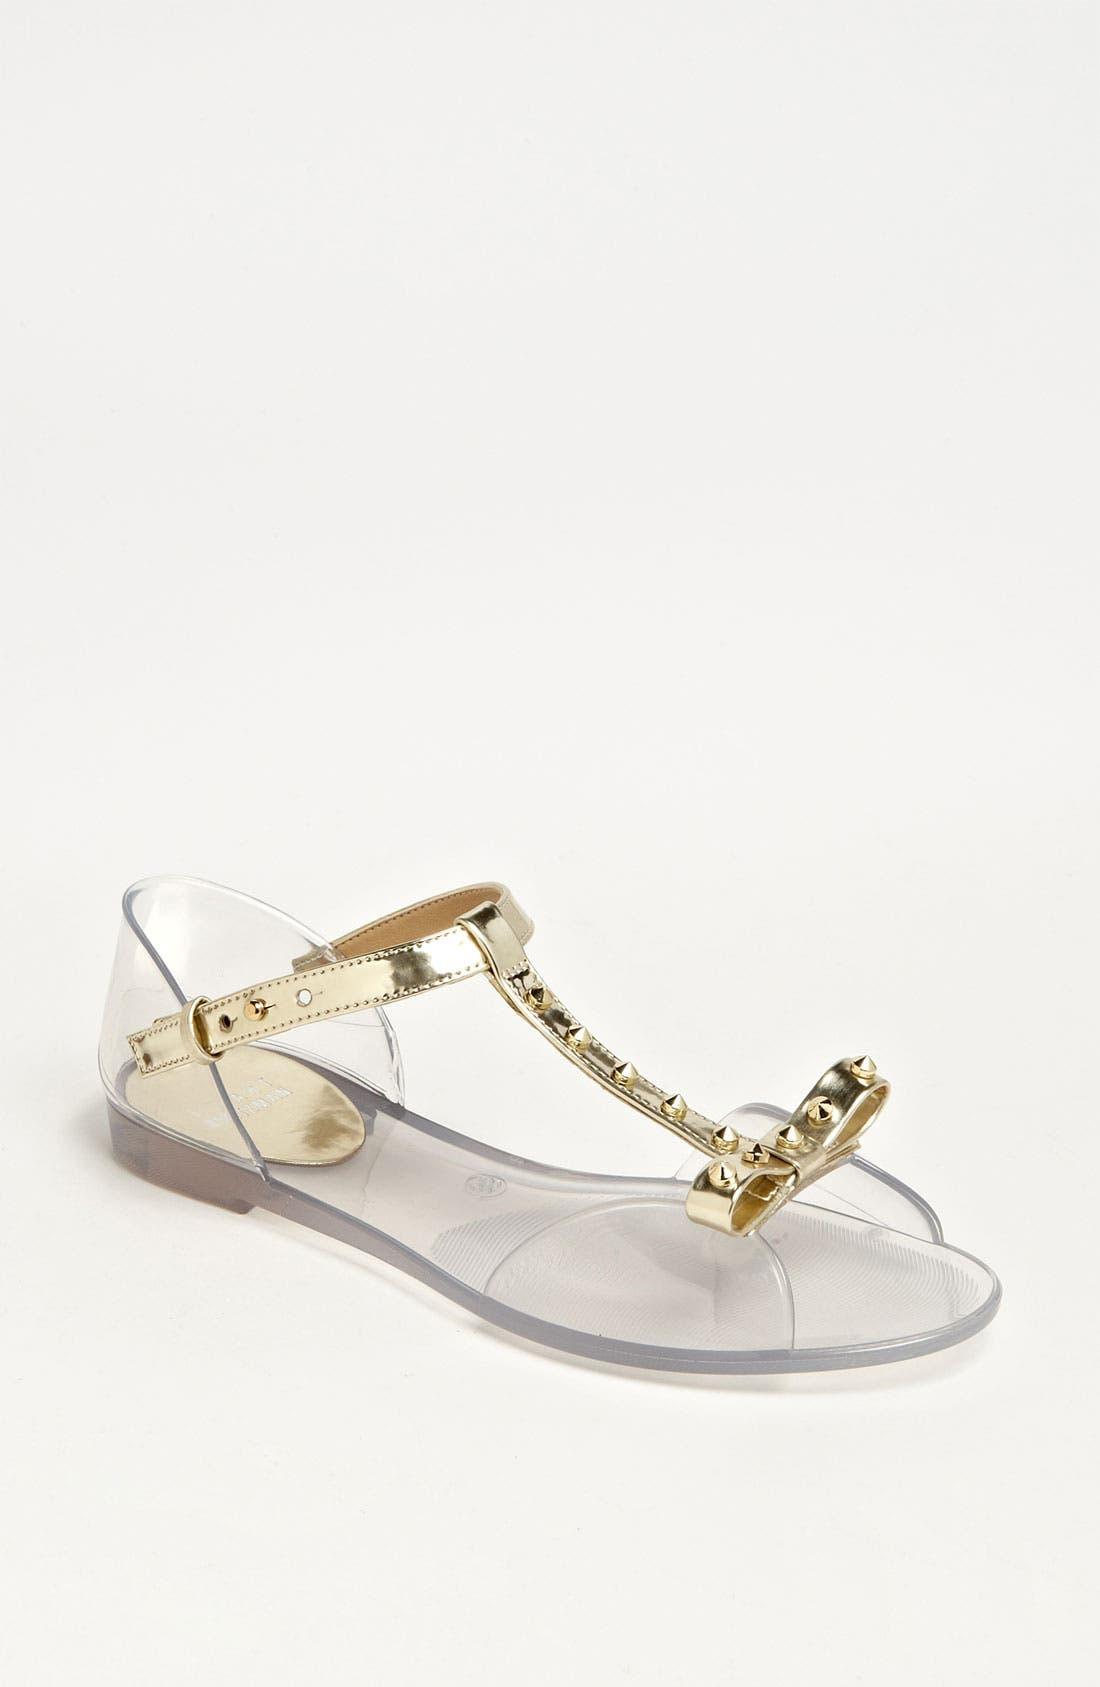 Main Image - Stuart Weitzman 'Nifty' Sandal